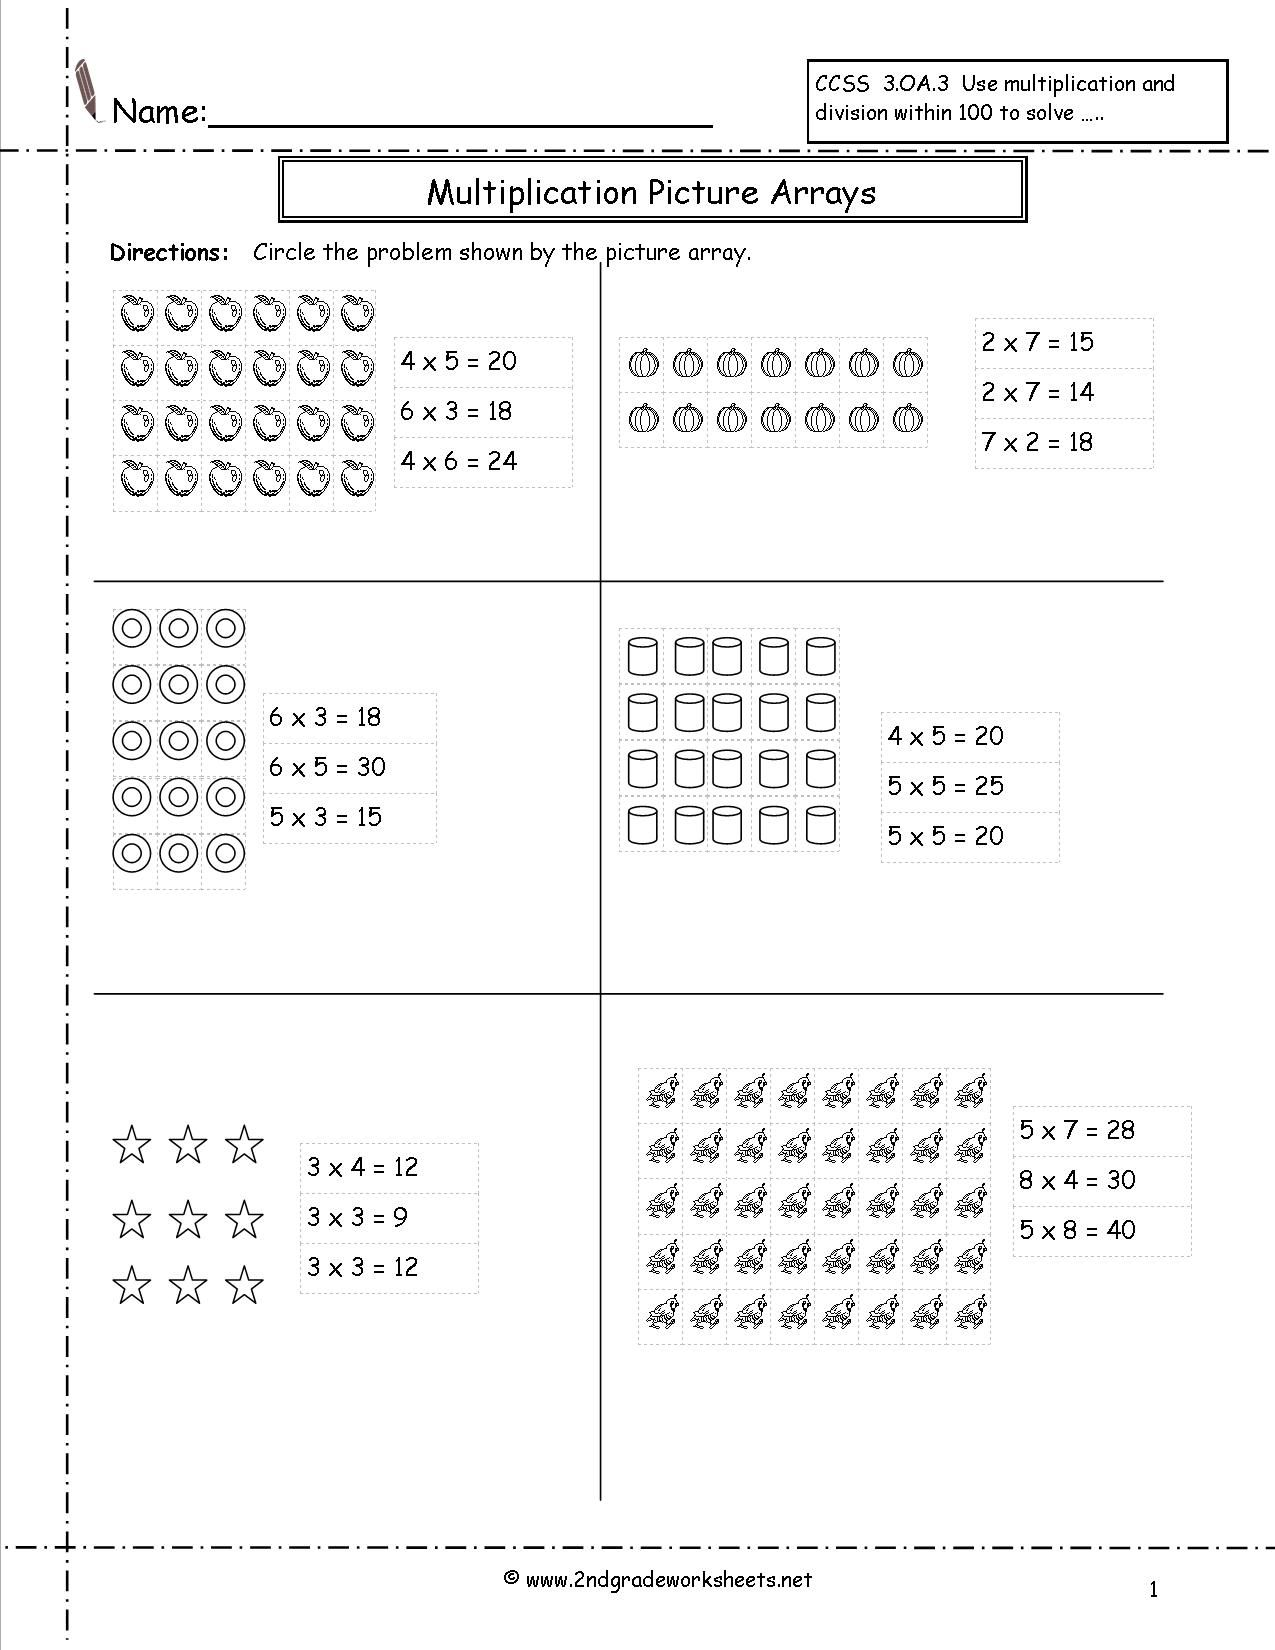 12 Photos of Multiplication Arrays Worksheet 2nd Grade   Array worksheets [ 1650 x 1275 Pixel ]